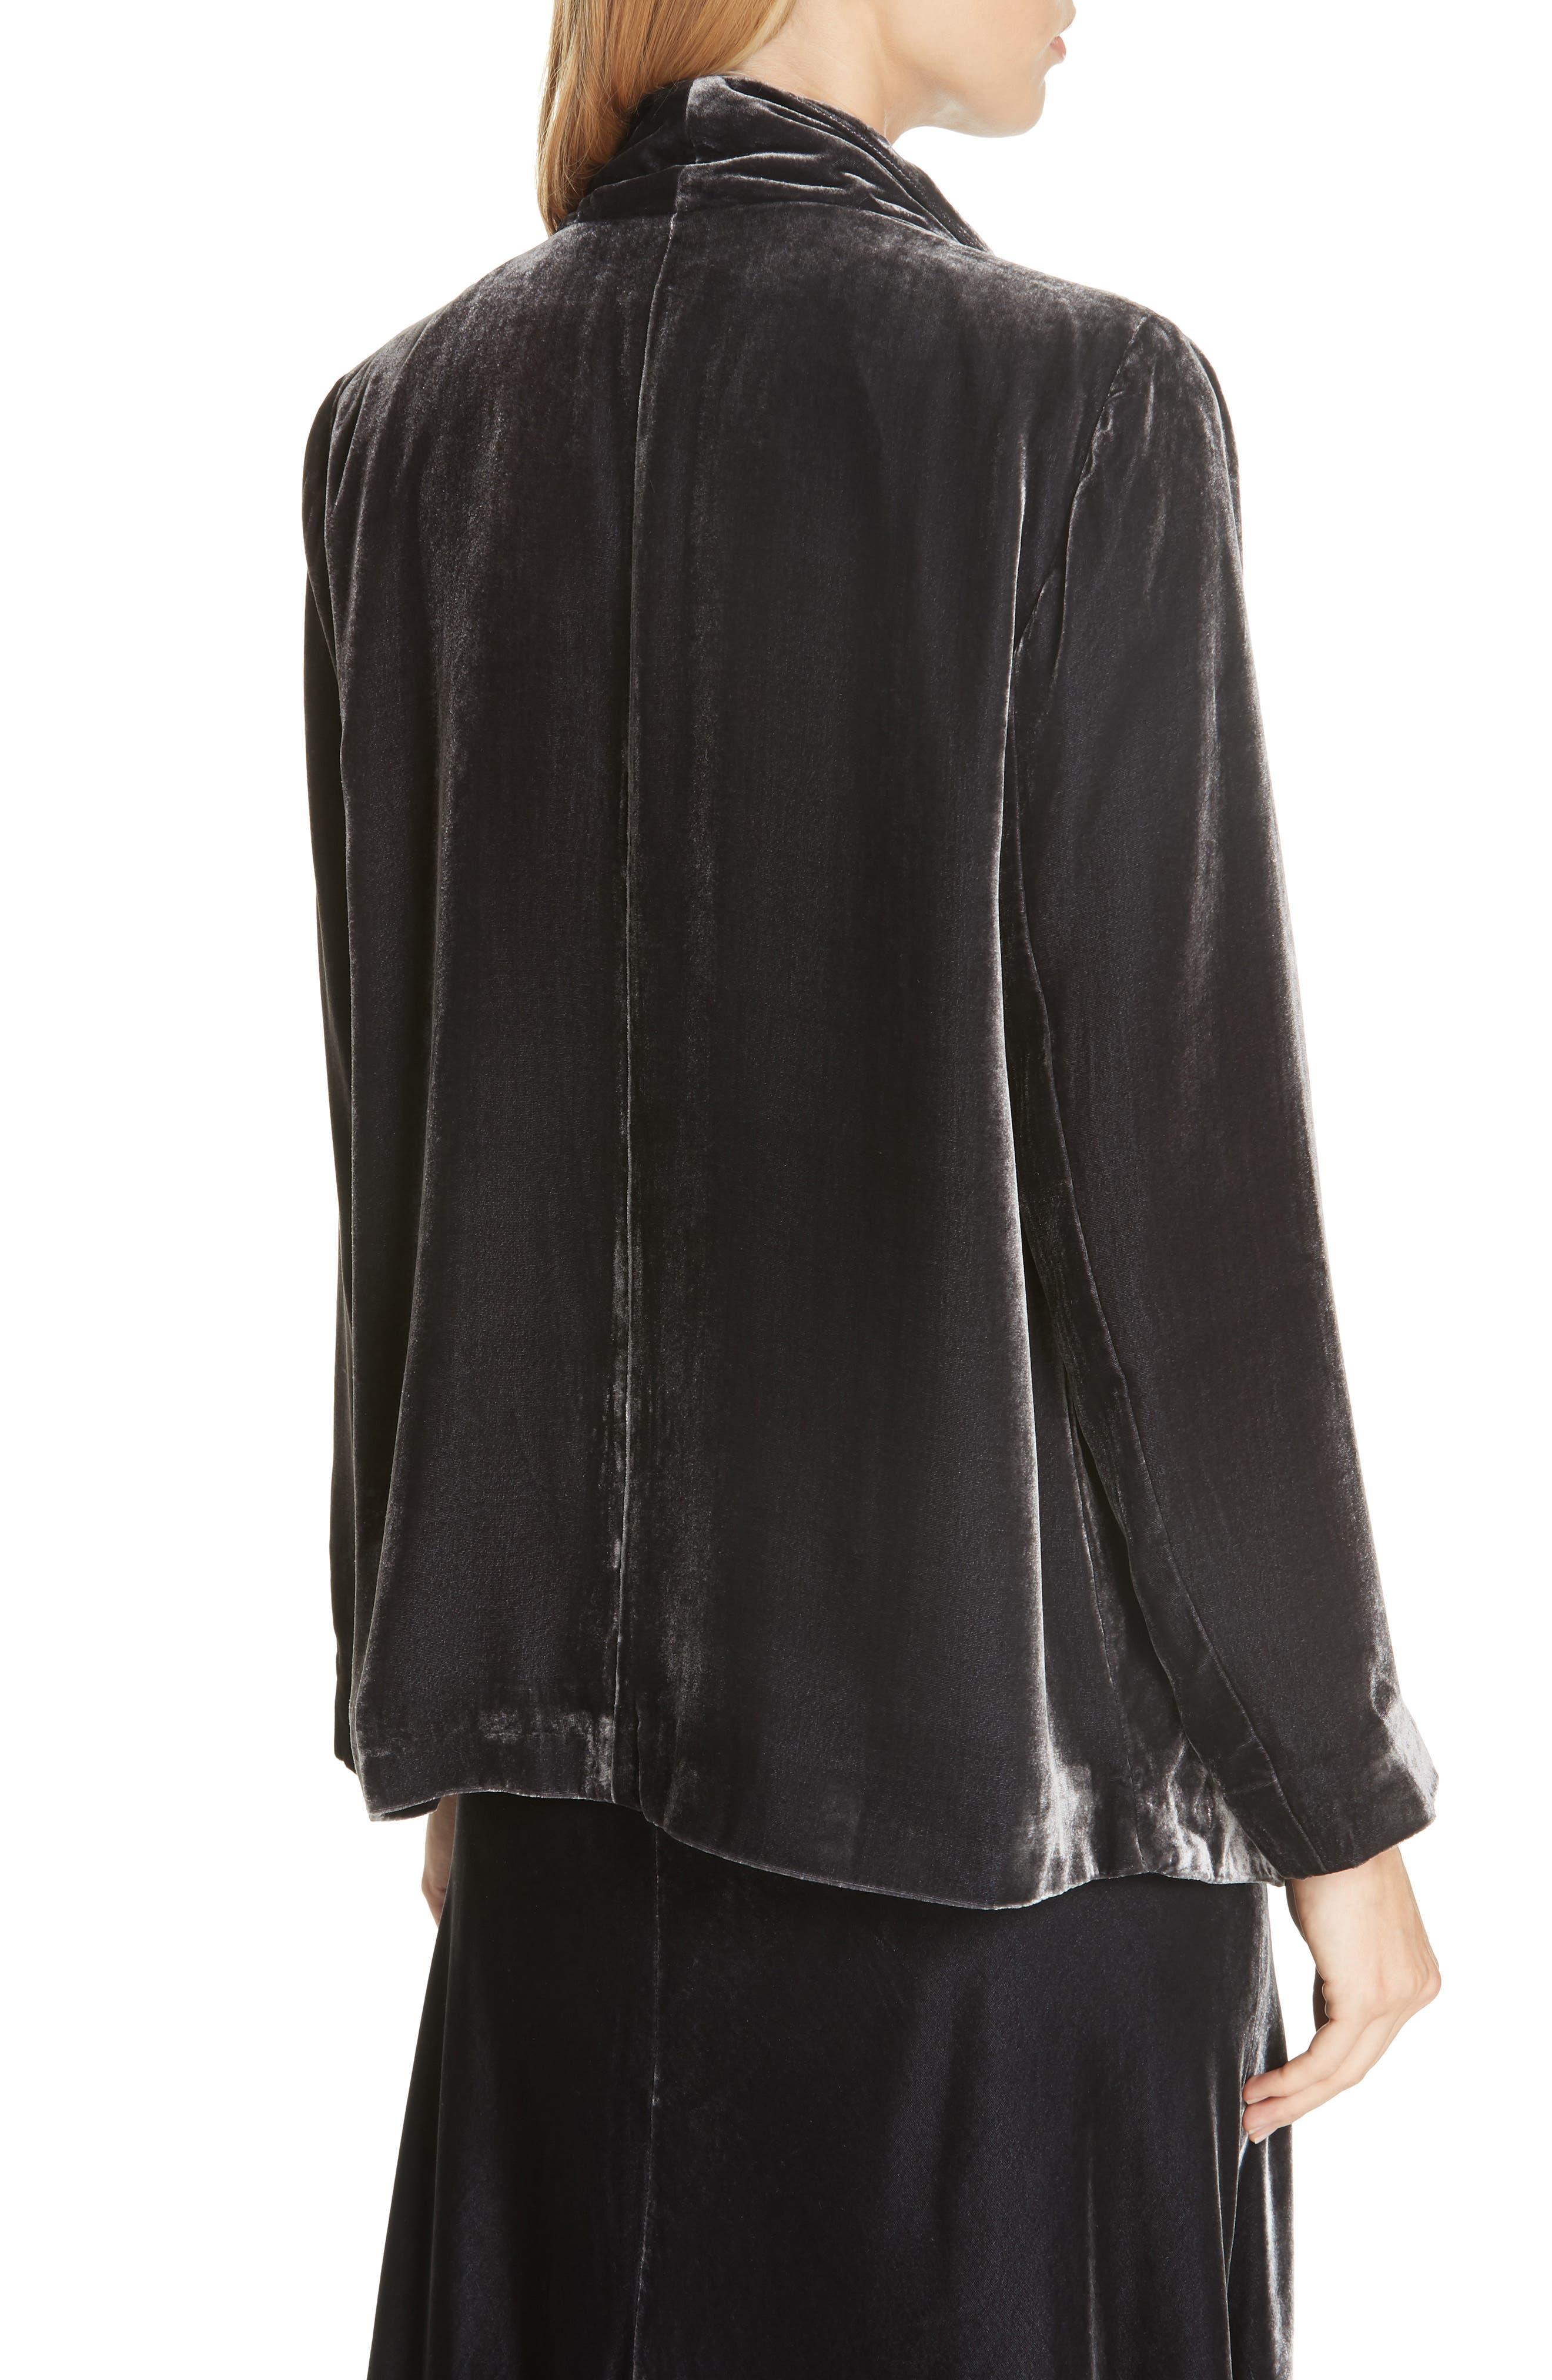 Angled Front Velvet Jacket,                             Alternate thumbnail 2, color,                             CHARCOAL